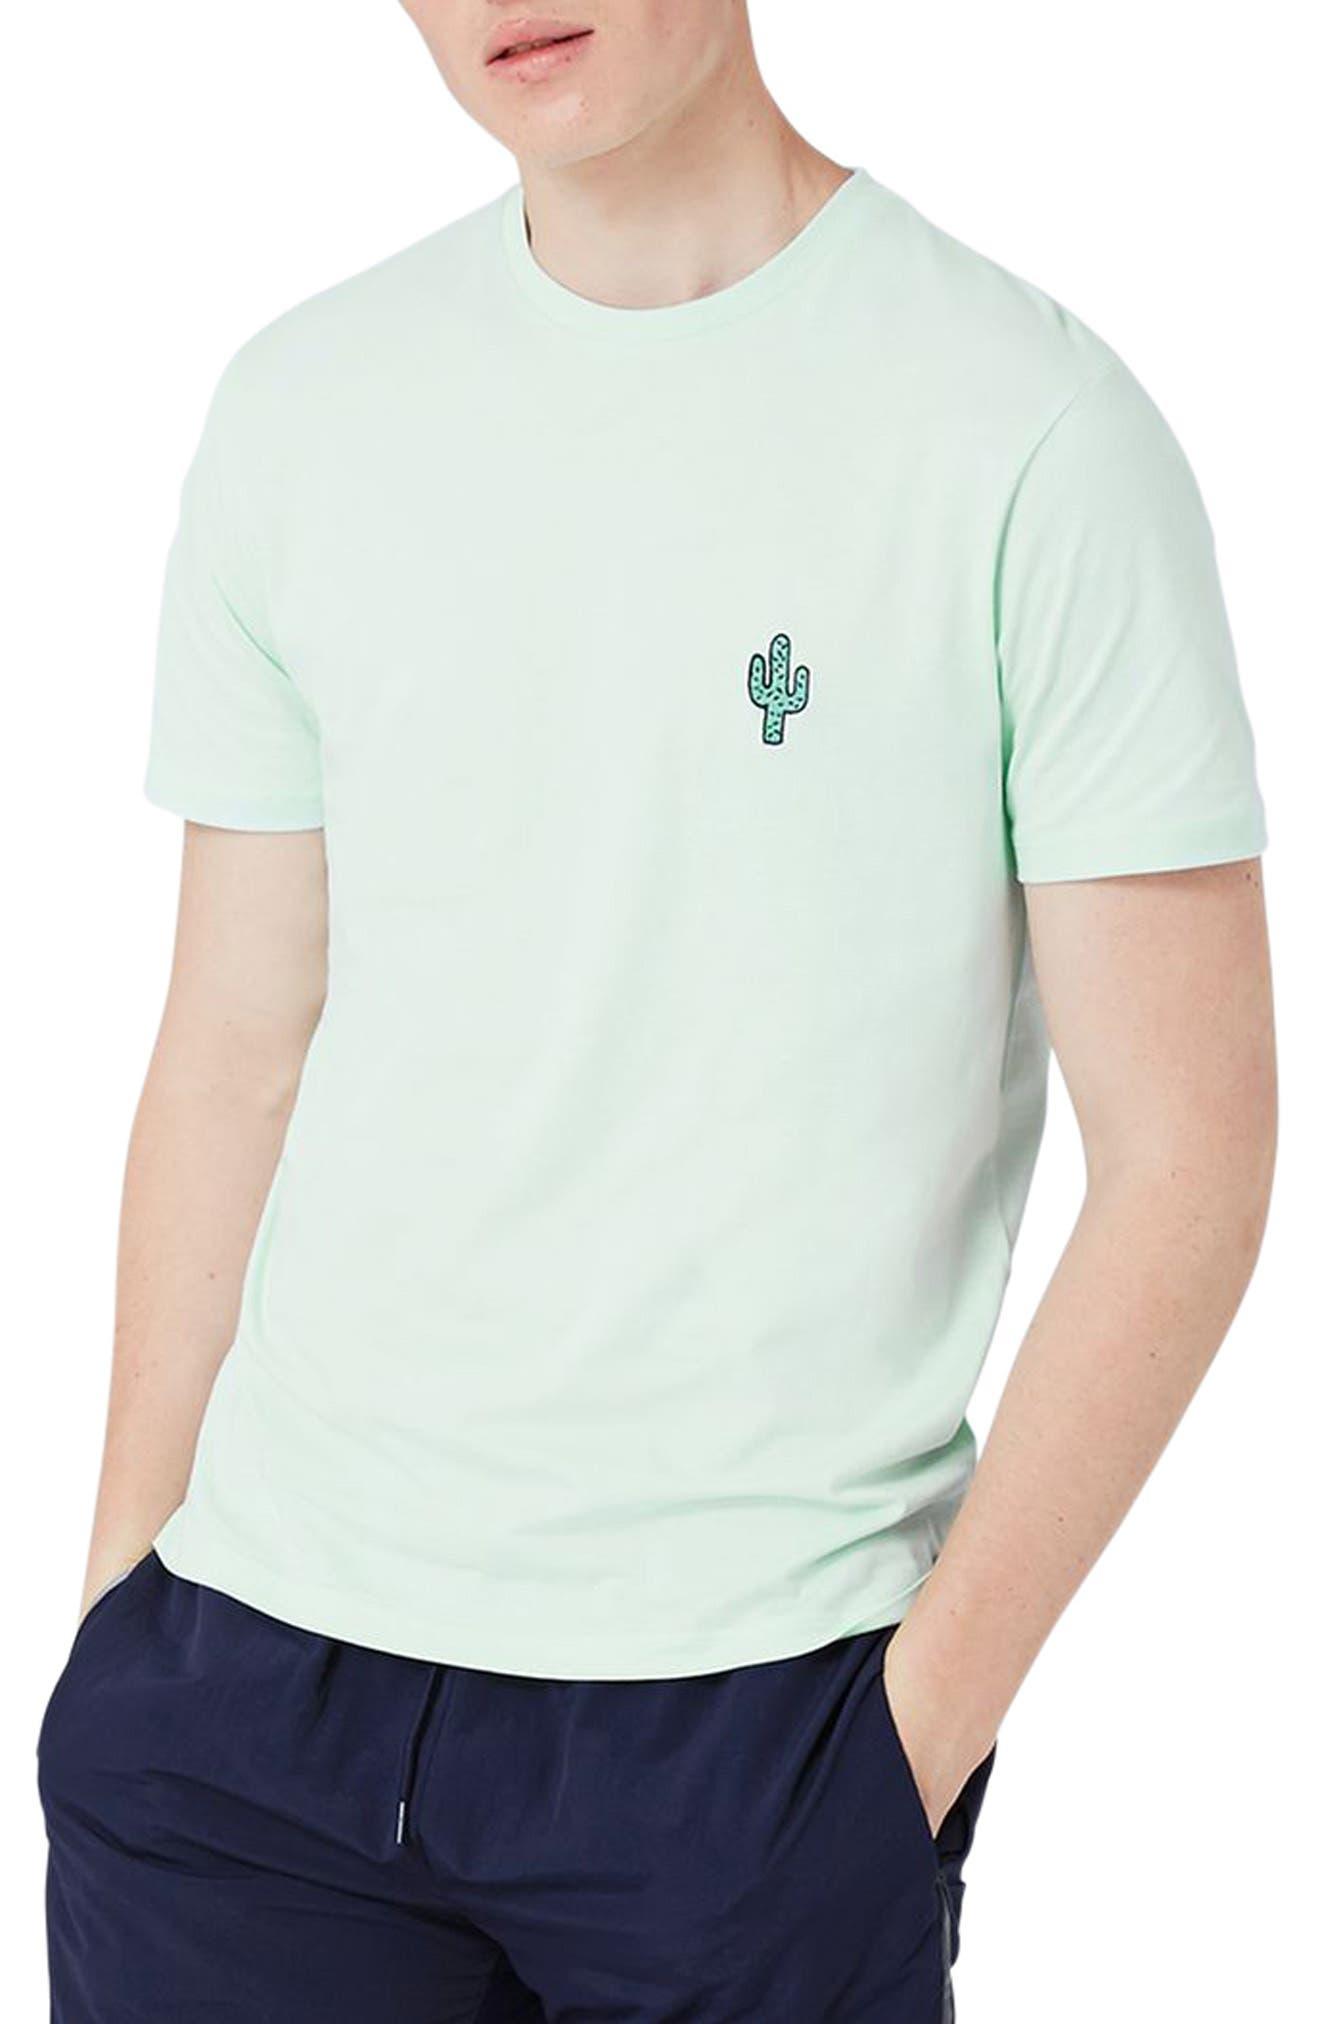 Topman Cactus Patch T-Shirt